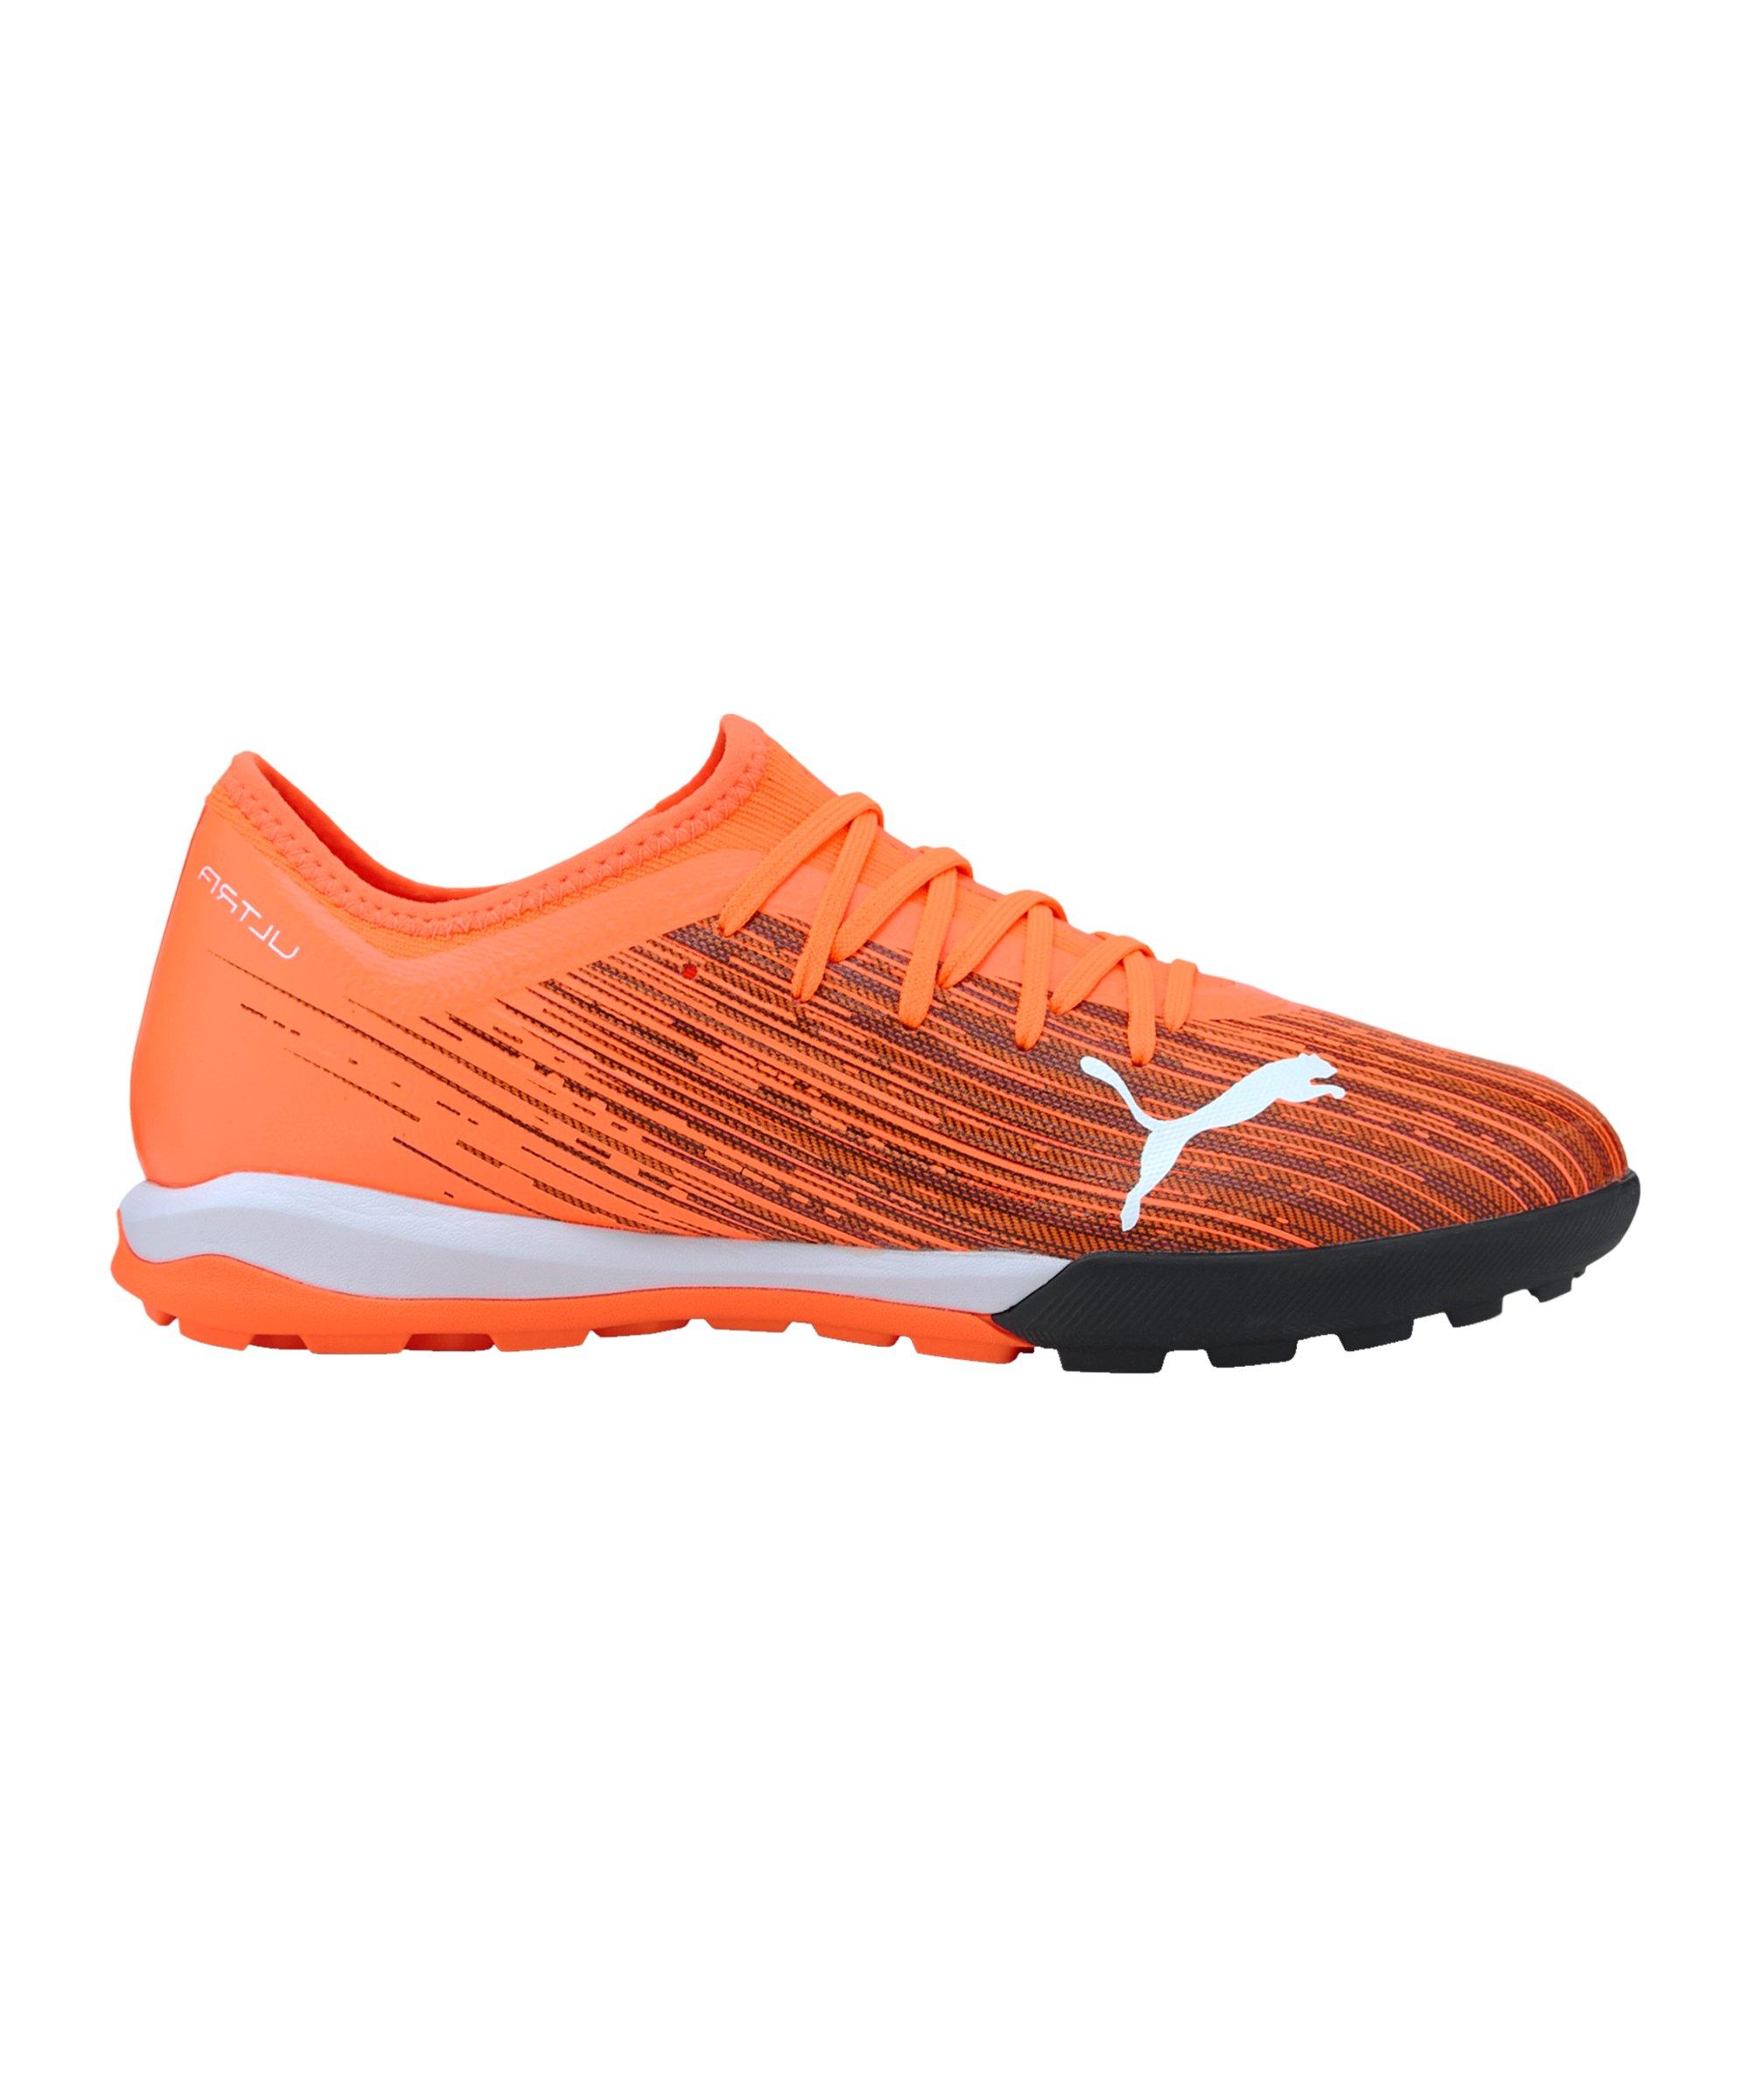 PUMA ULTRA Chasing Adrenaline 3.1 TT Turf Orange F01 - orange